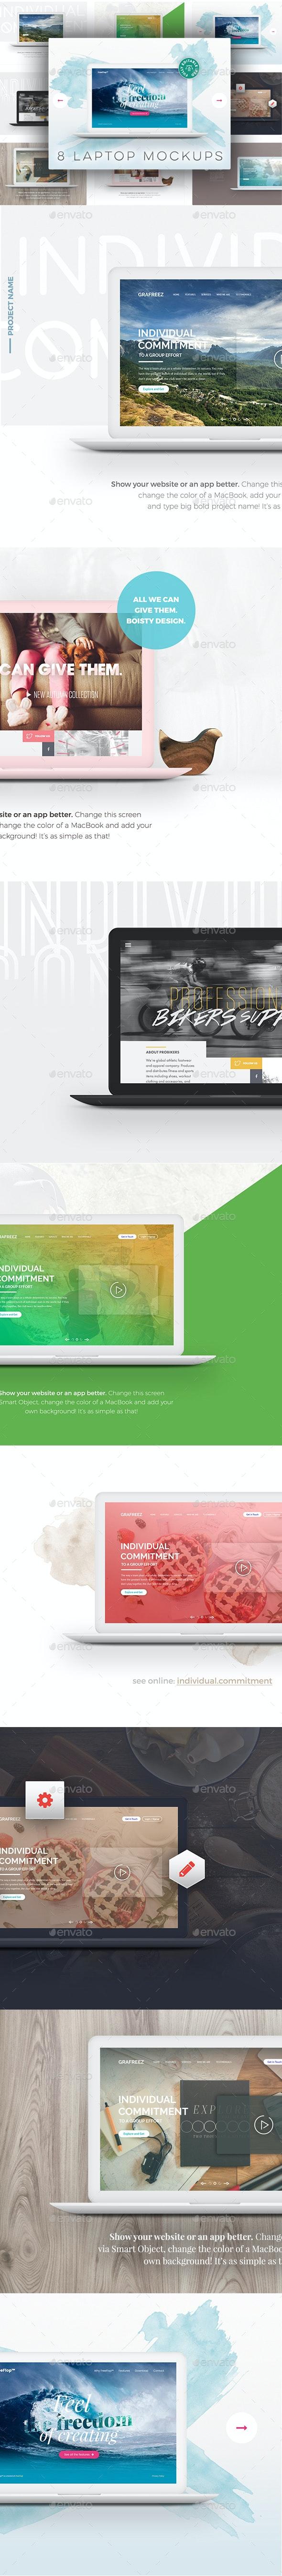 8 Editable Laptop Mockups - Product Mock-Ups Graphics